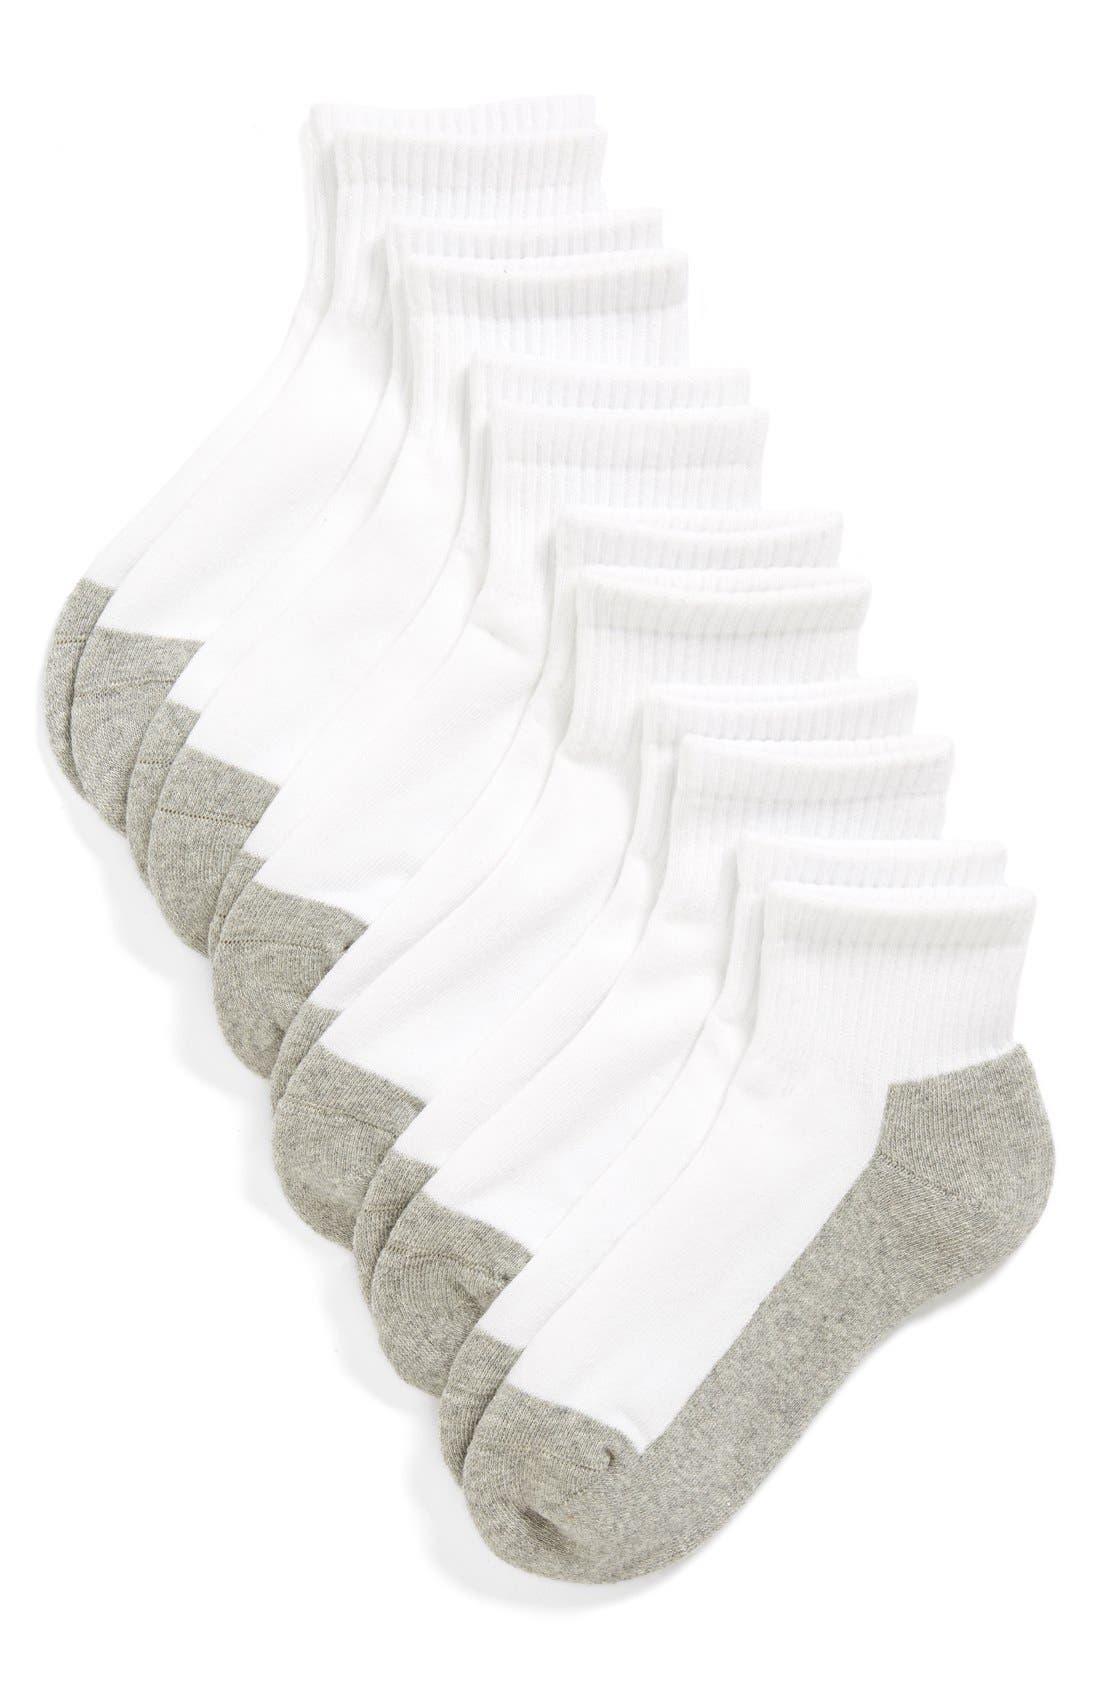 6-Pack Active Quarter Socks,                             Main thumbnail 1, color,                             WHITE/ GREY